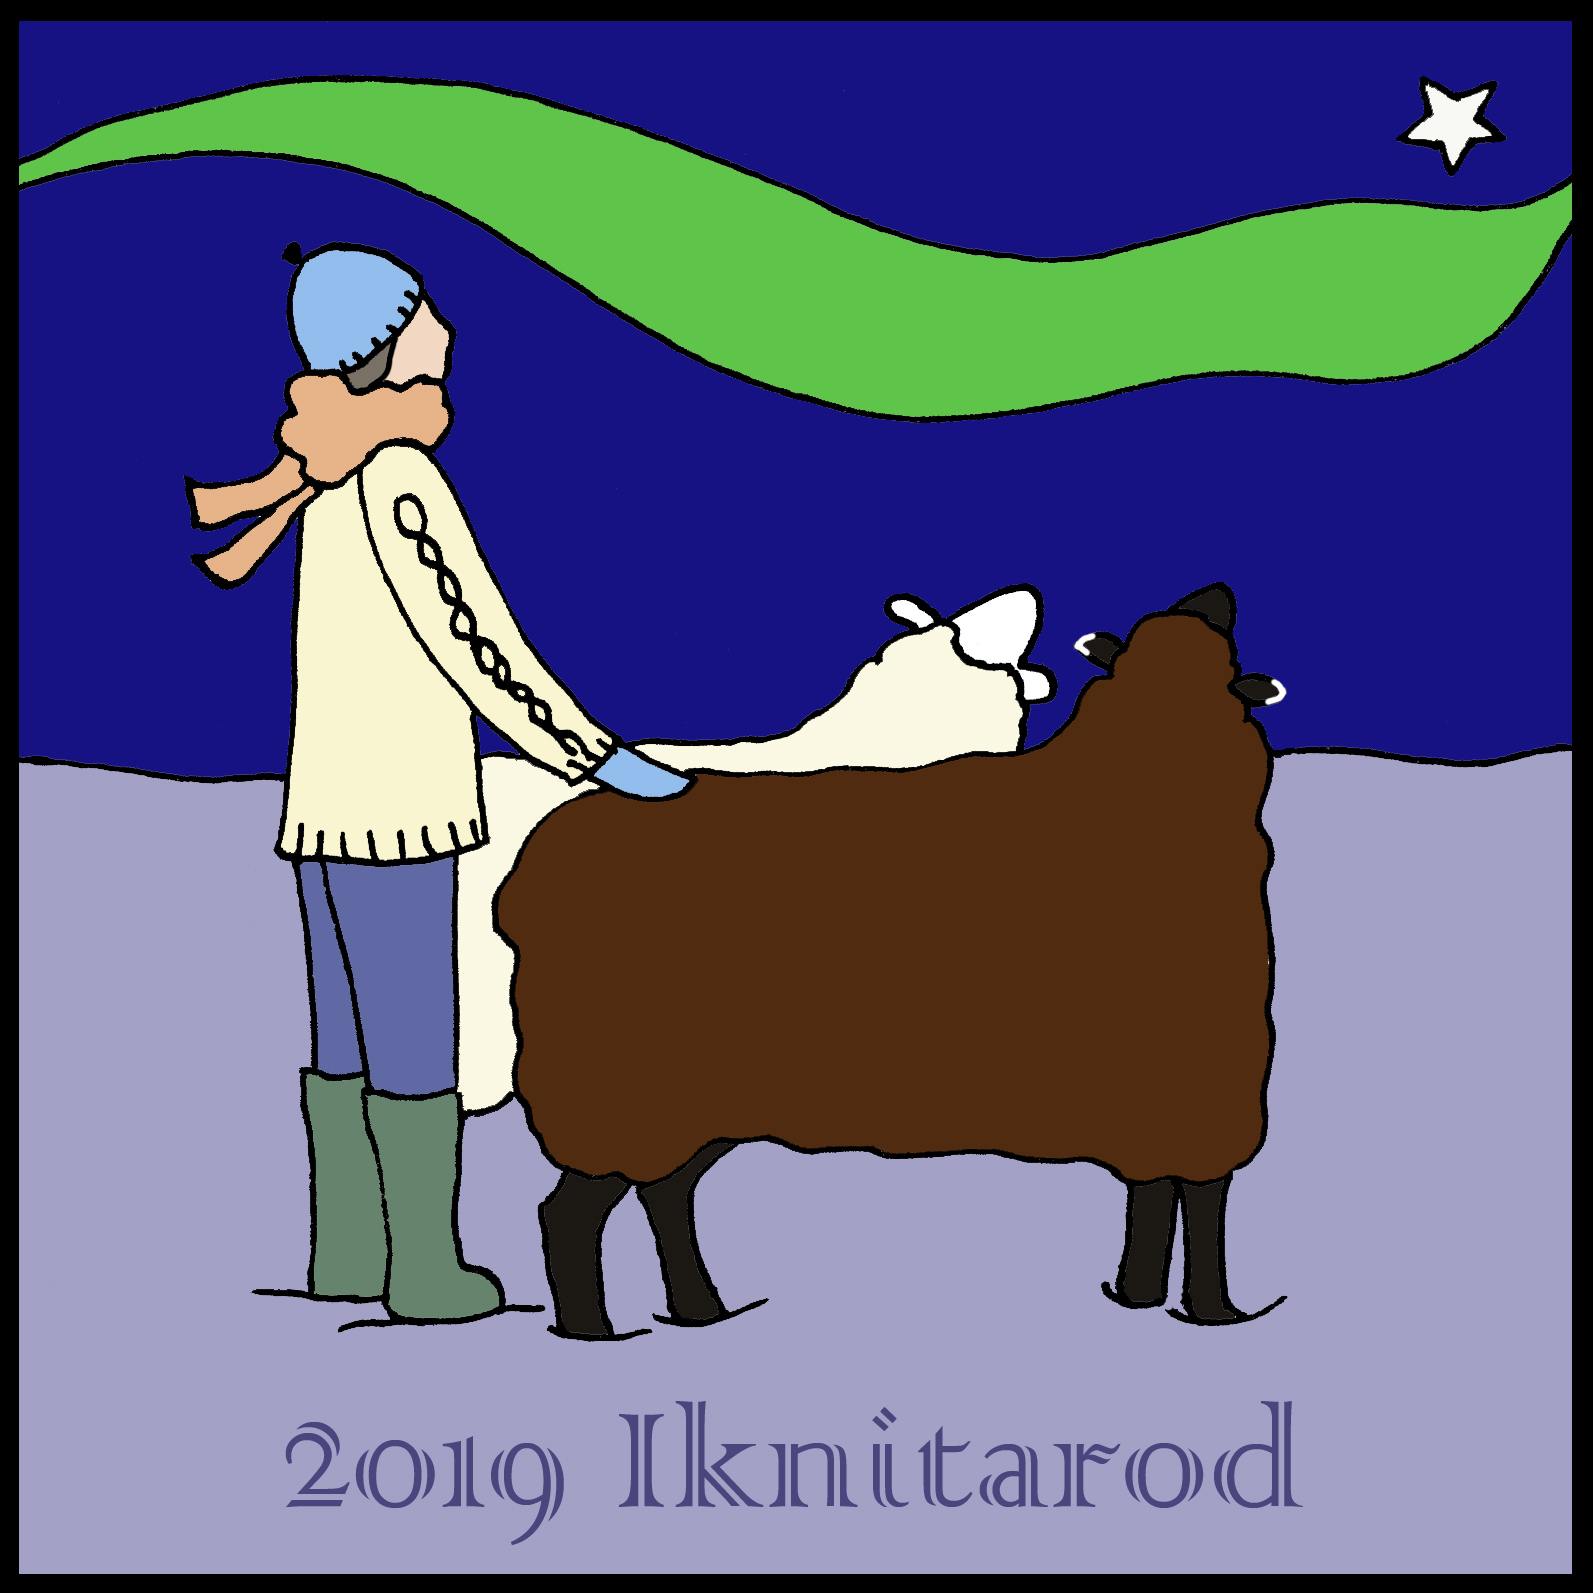 2019 Iknitarod/Iknitaredux